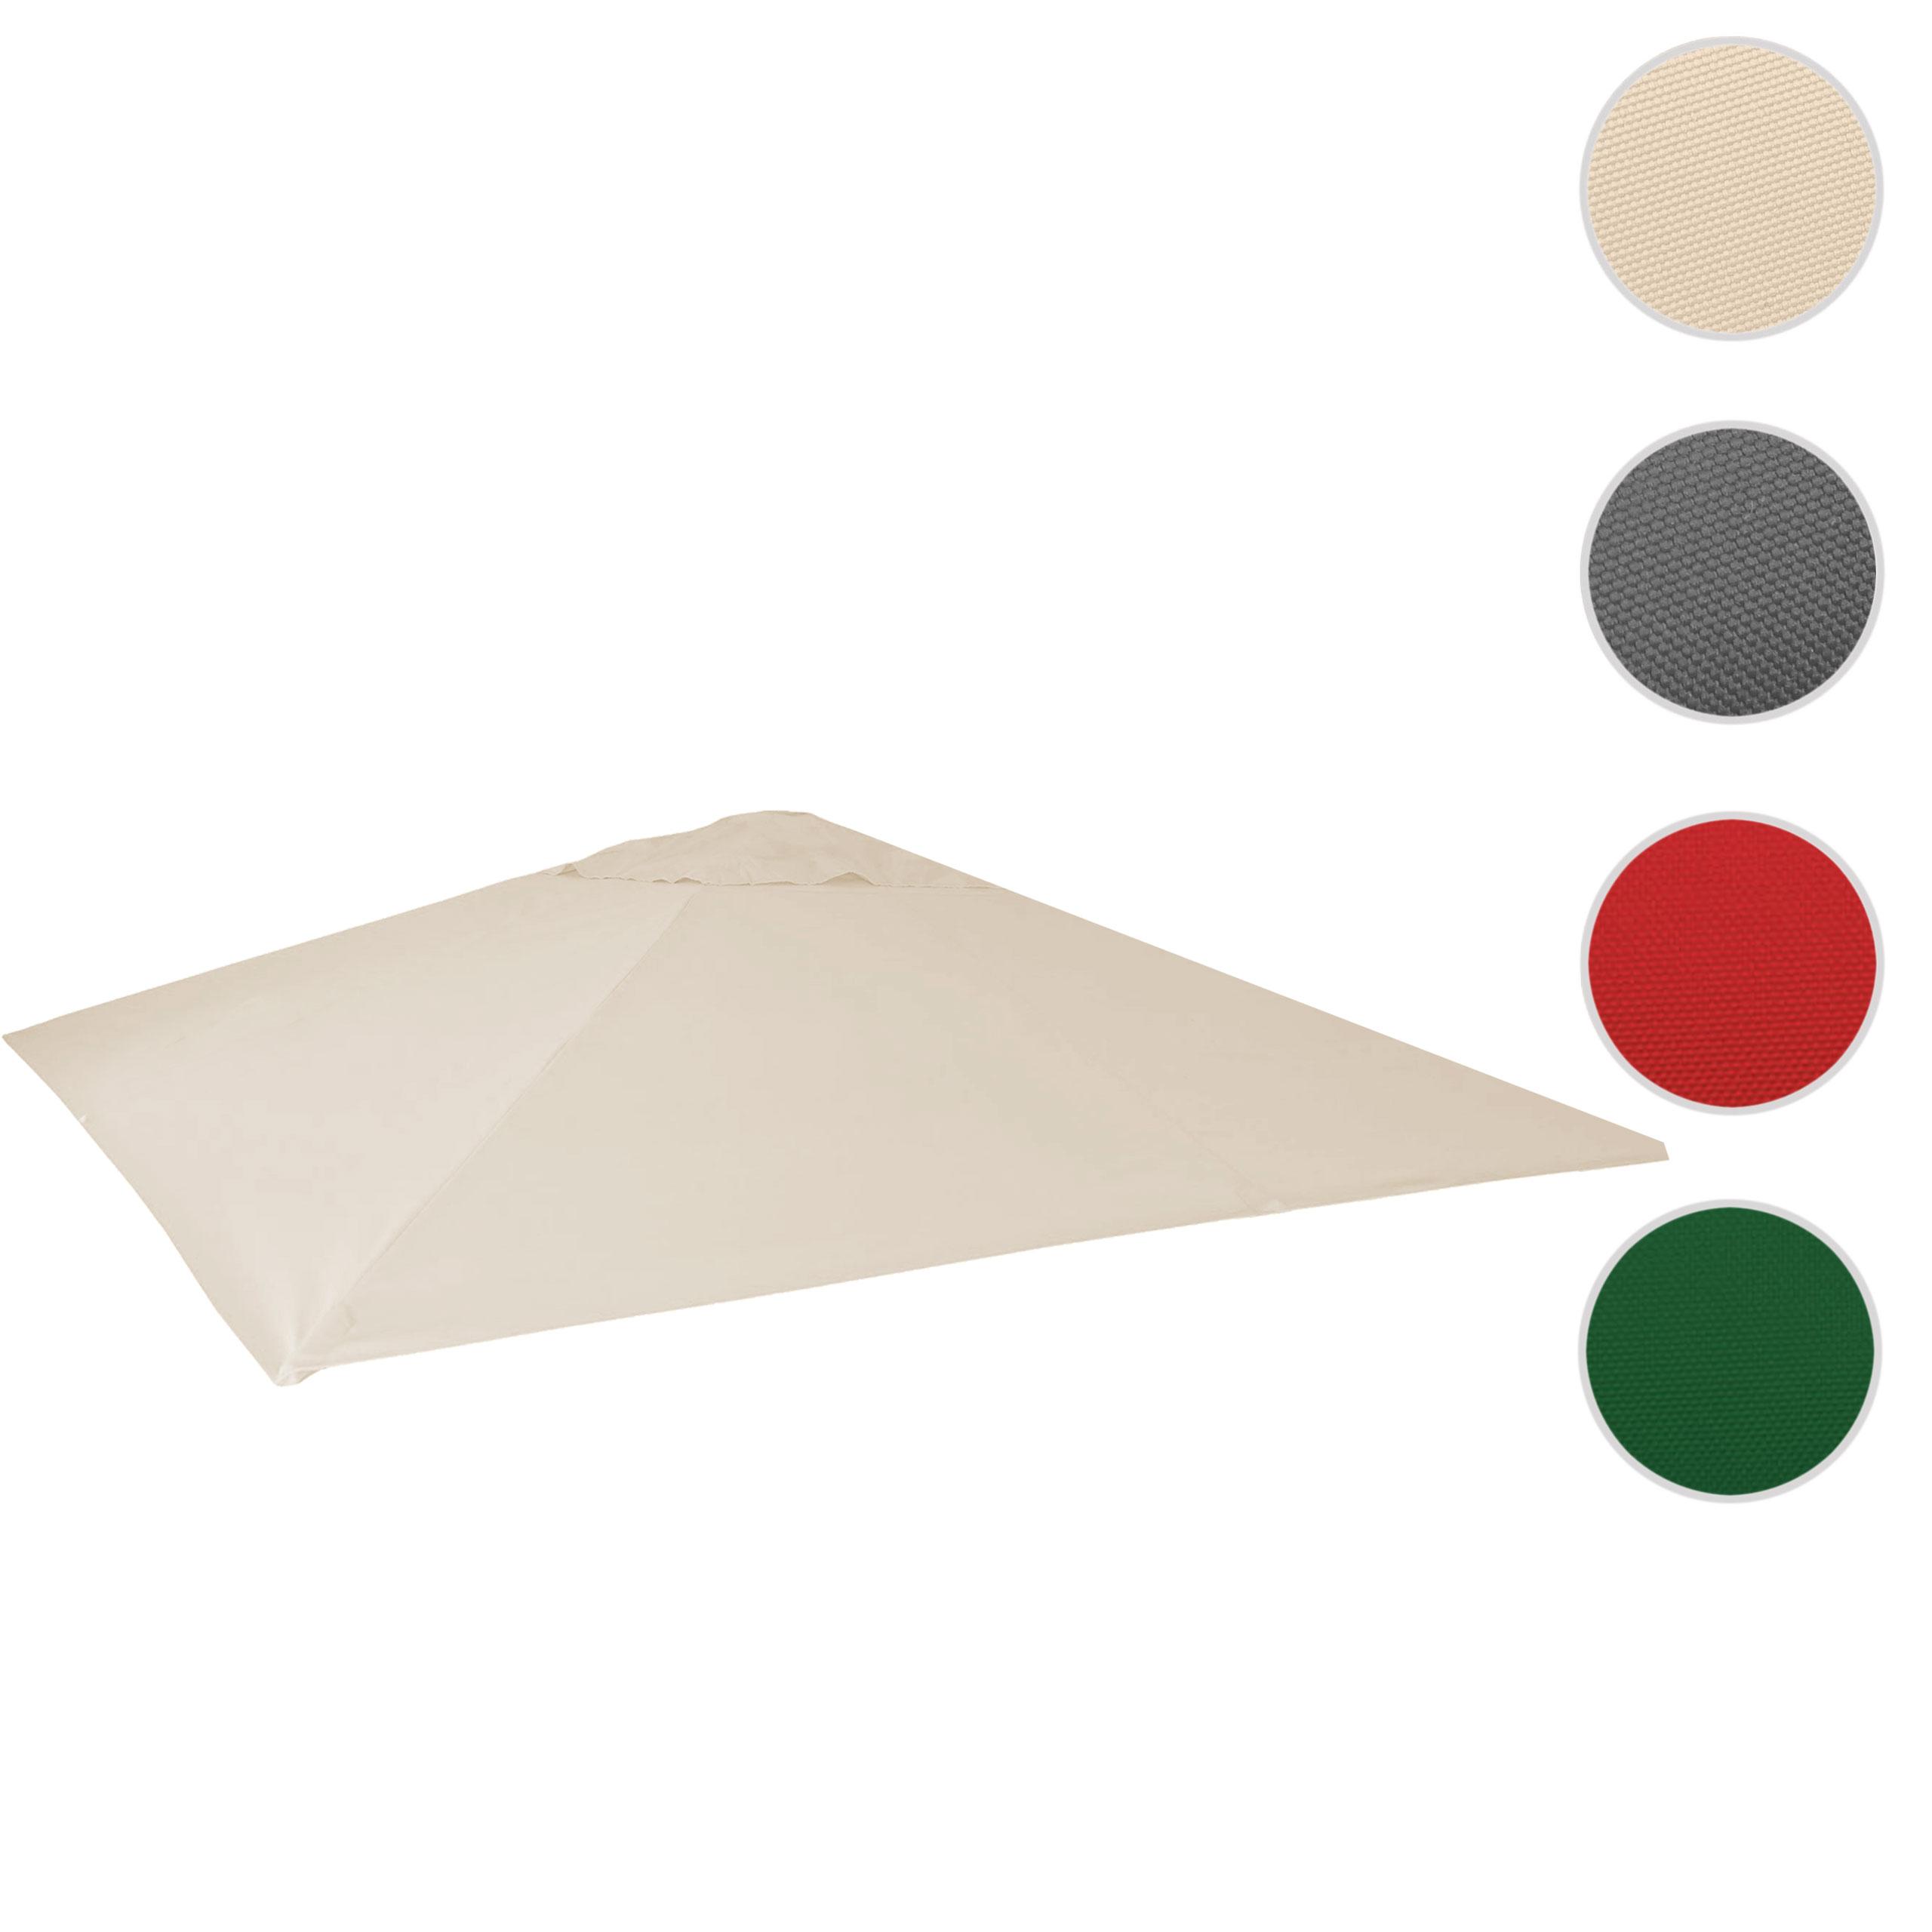 Mendler Bezug für Gastronomie Sonnenschirm HWC-D20, Sonnenschirmbezug Ersatzbezug, 5x5m (Ř7,2m) Polyester ~ 58589